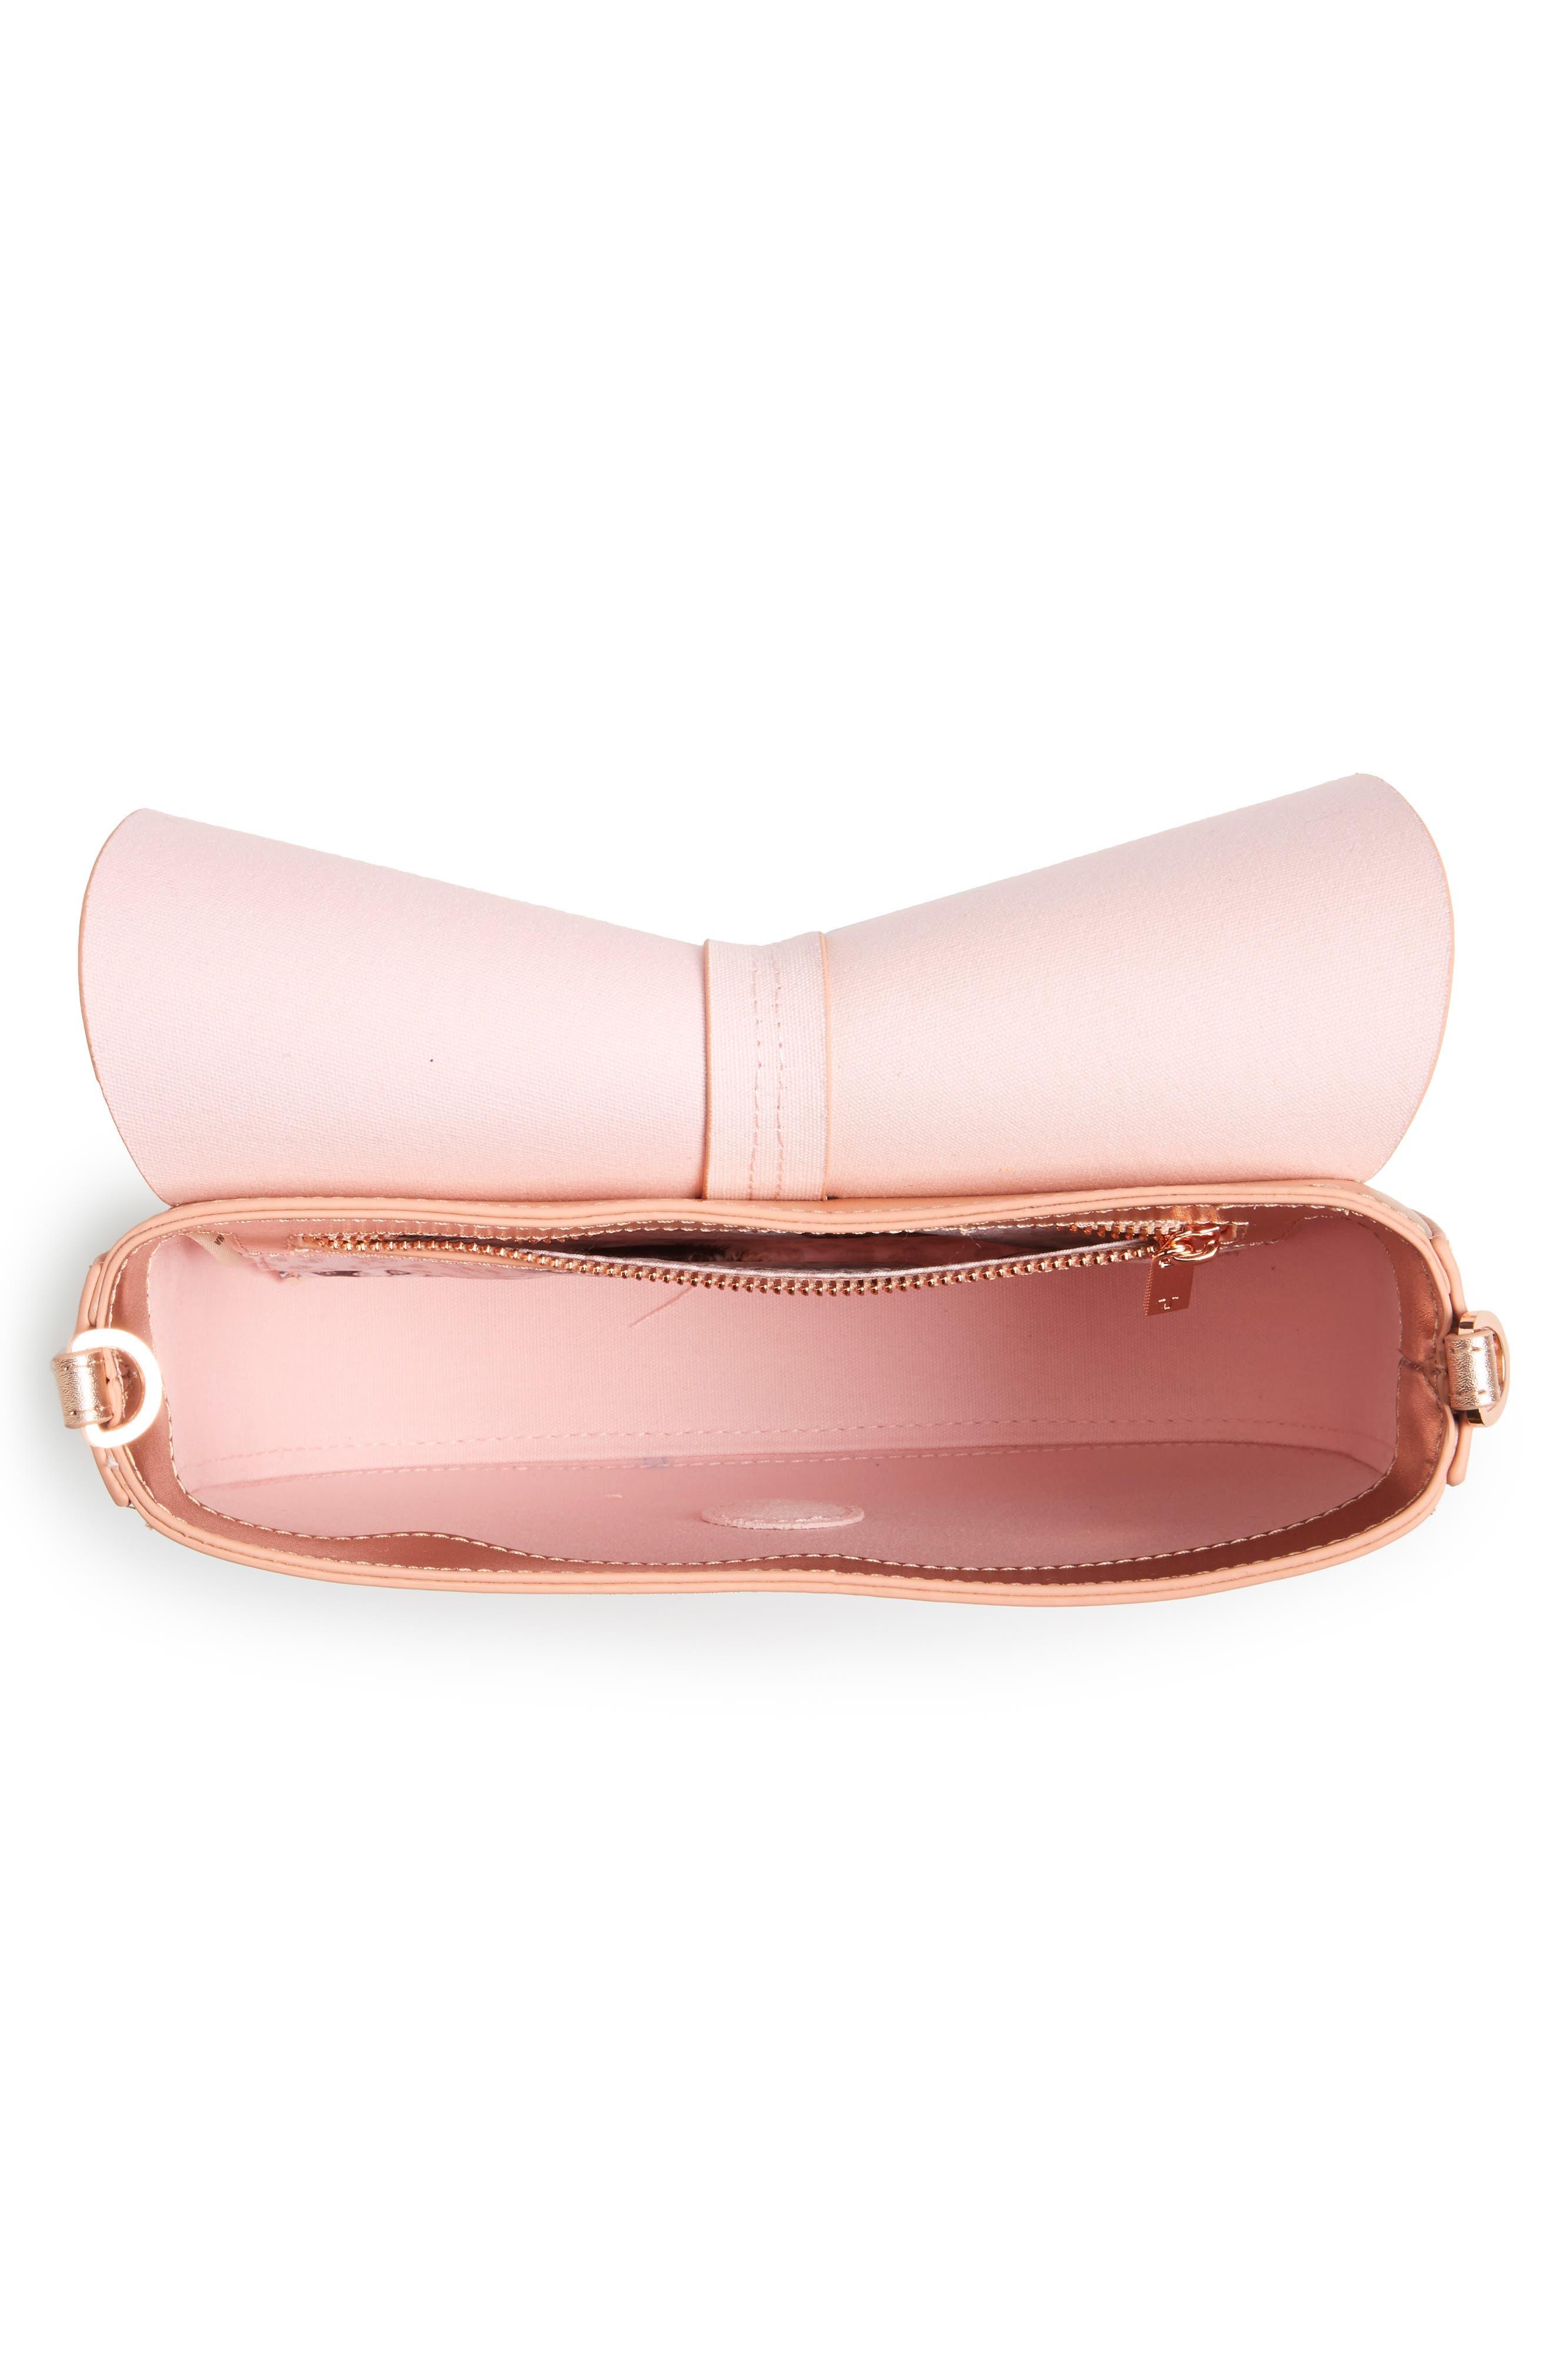 Kittii Cat Leather Crossbody Bag,                             Alternate thumbnail 4, color,                             Rose Gold